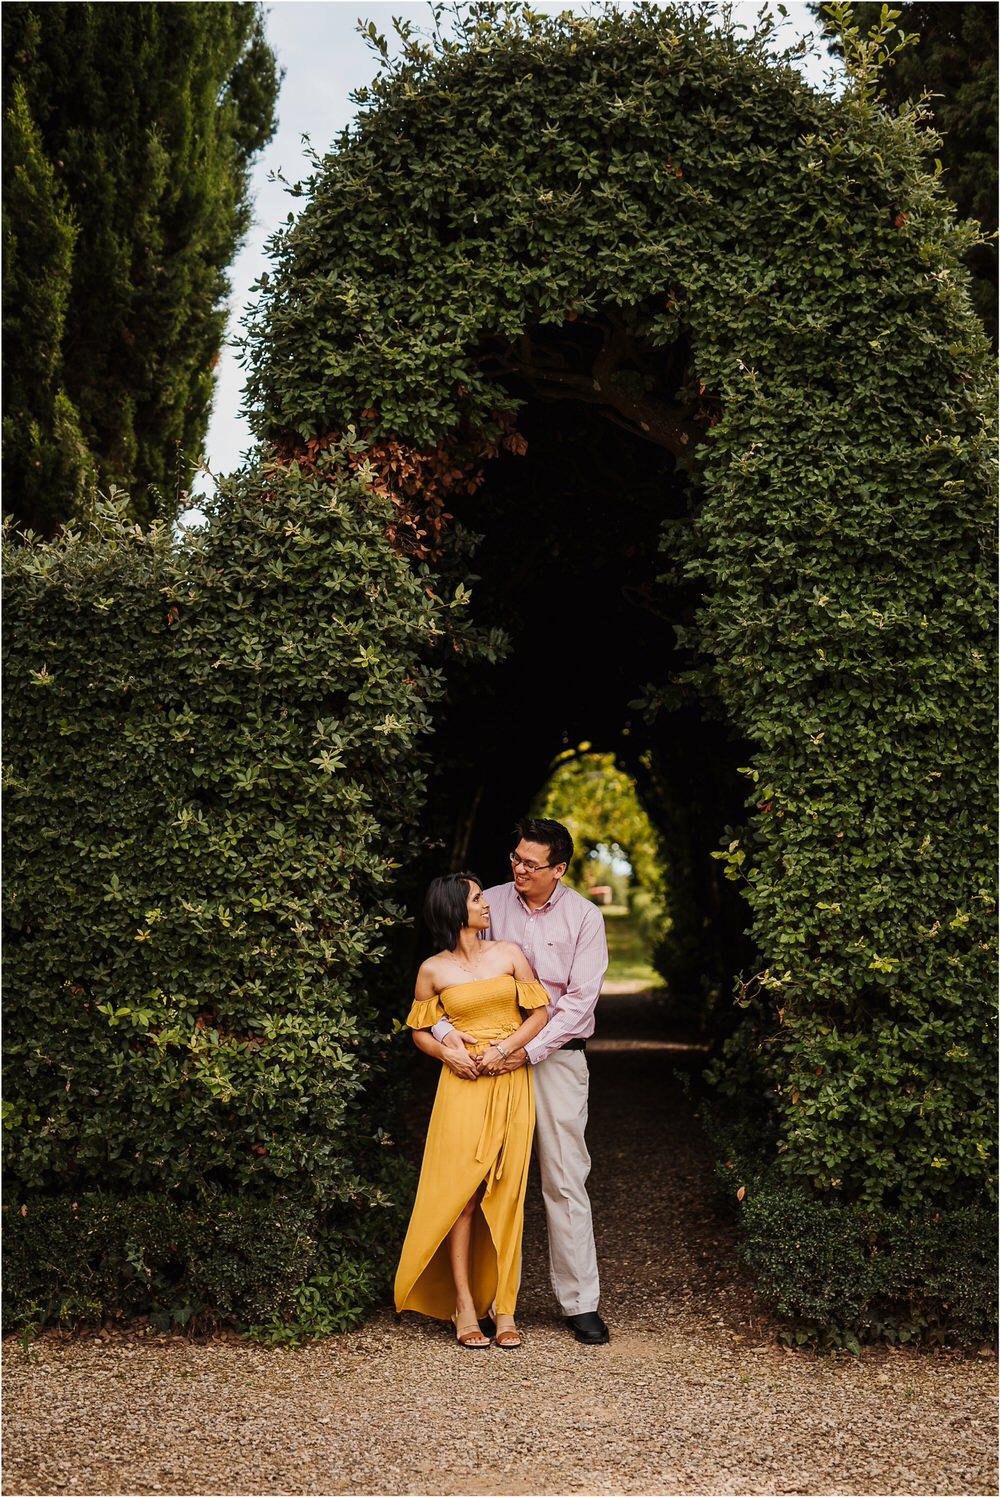 tuscany siena wedding anniversary honeymoon photography photographer italy matrimonio destination val d'orcia toscana 0017.jpg